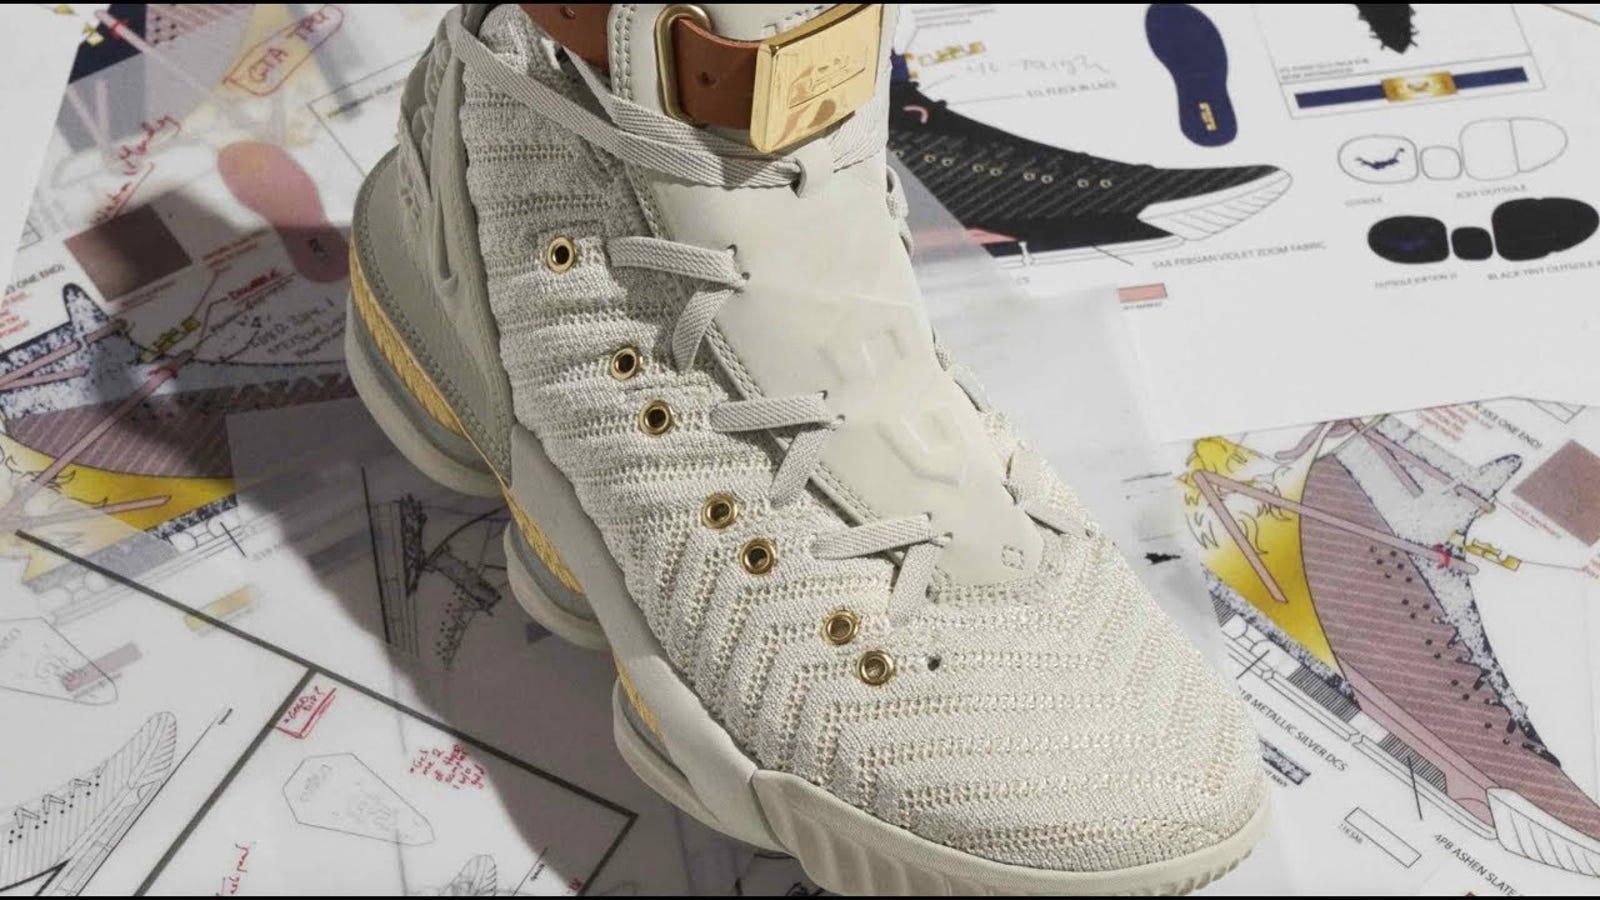 212ee31a4a80 Nike s HFR x LeBron 16 Is Black Female Designer-Fueled Dream